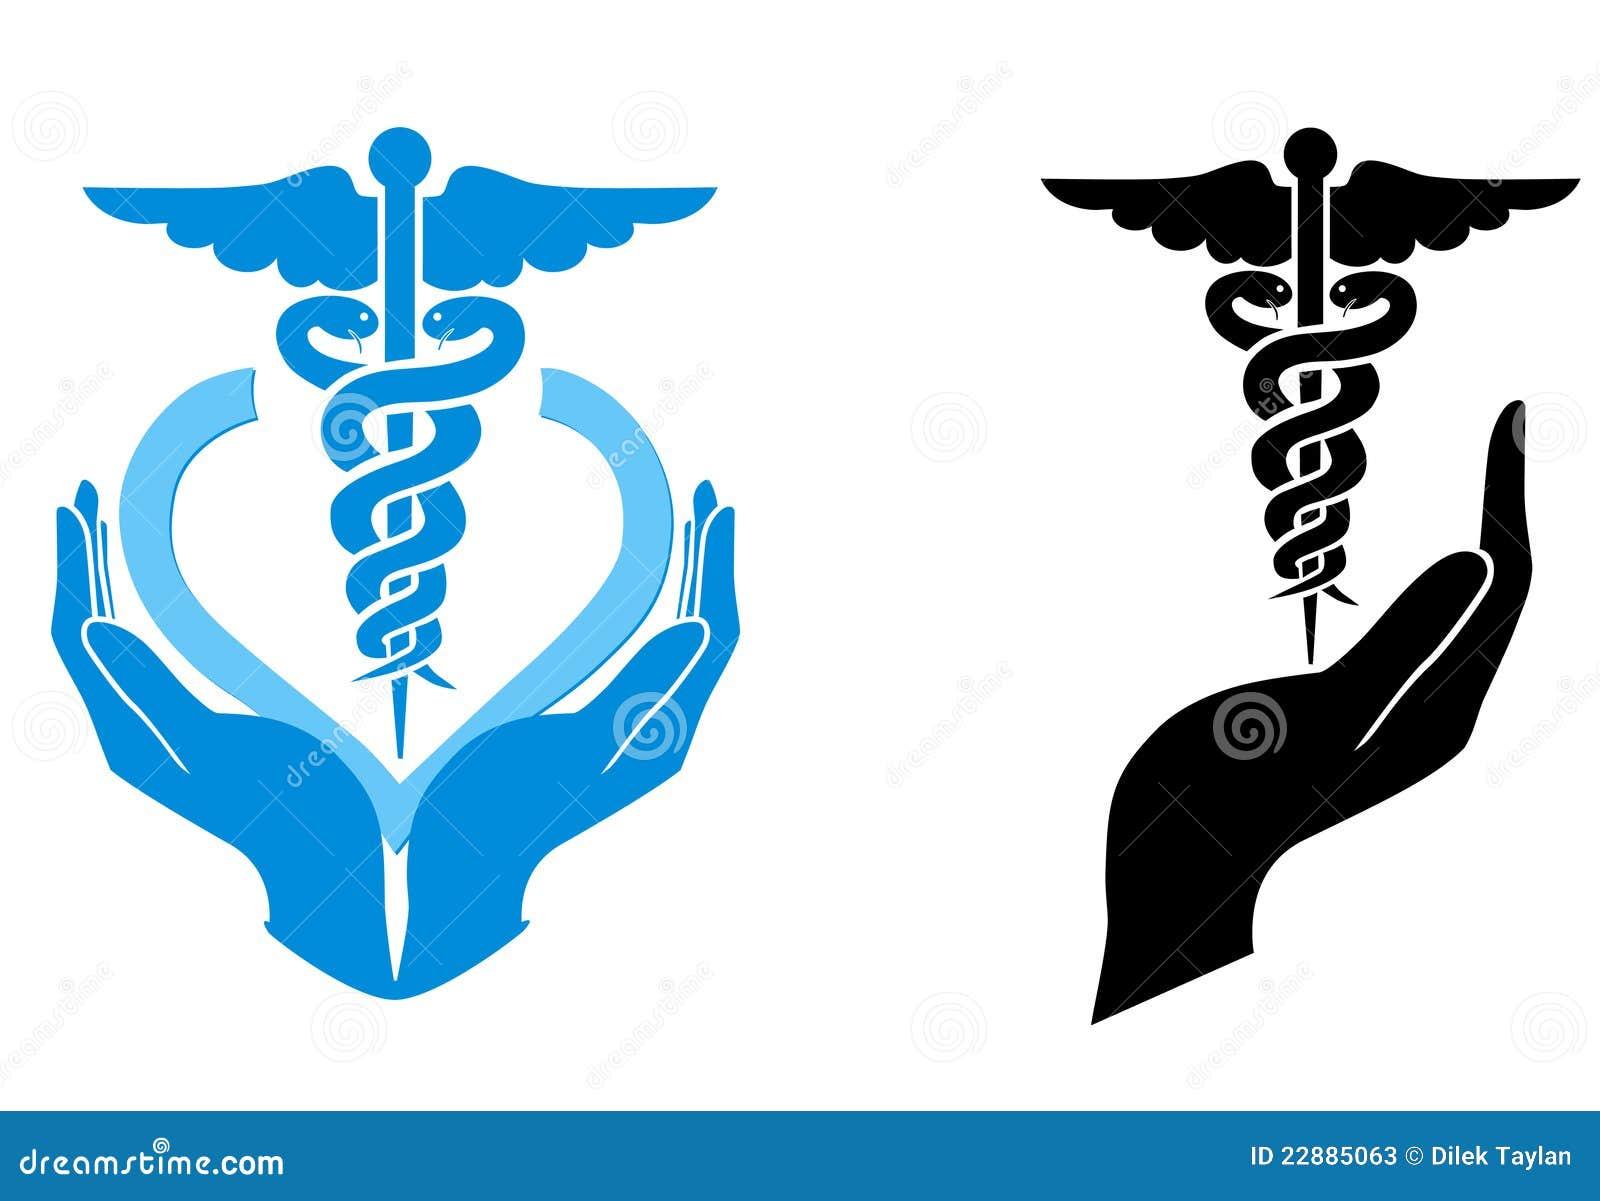 medical-care-symbol-22885063.jpg